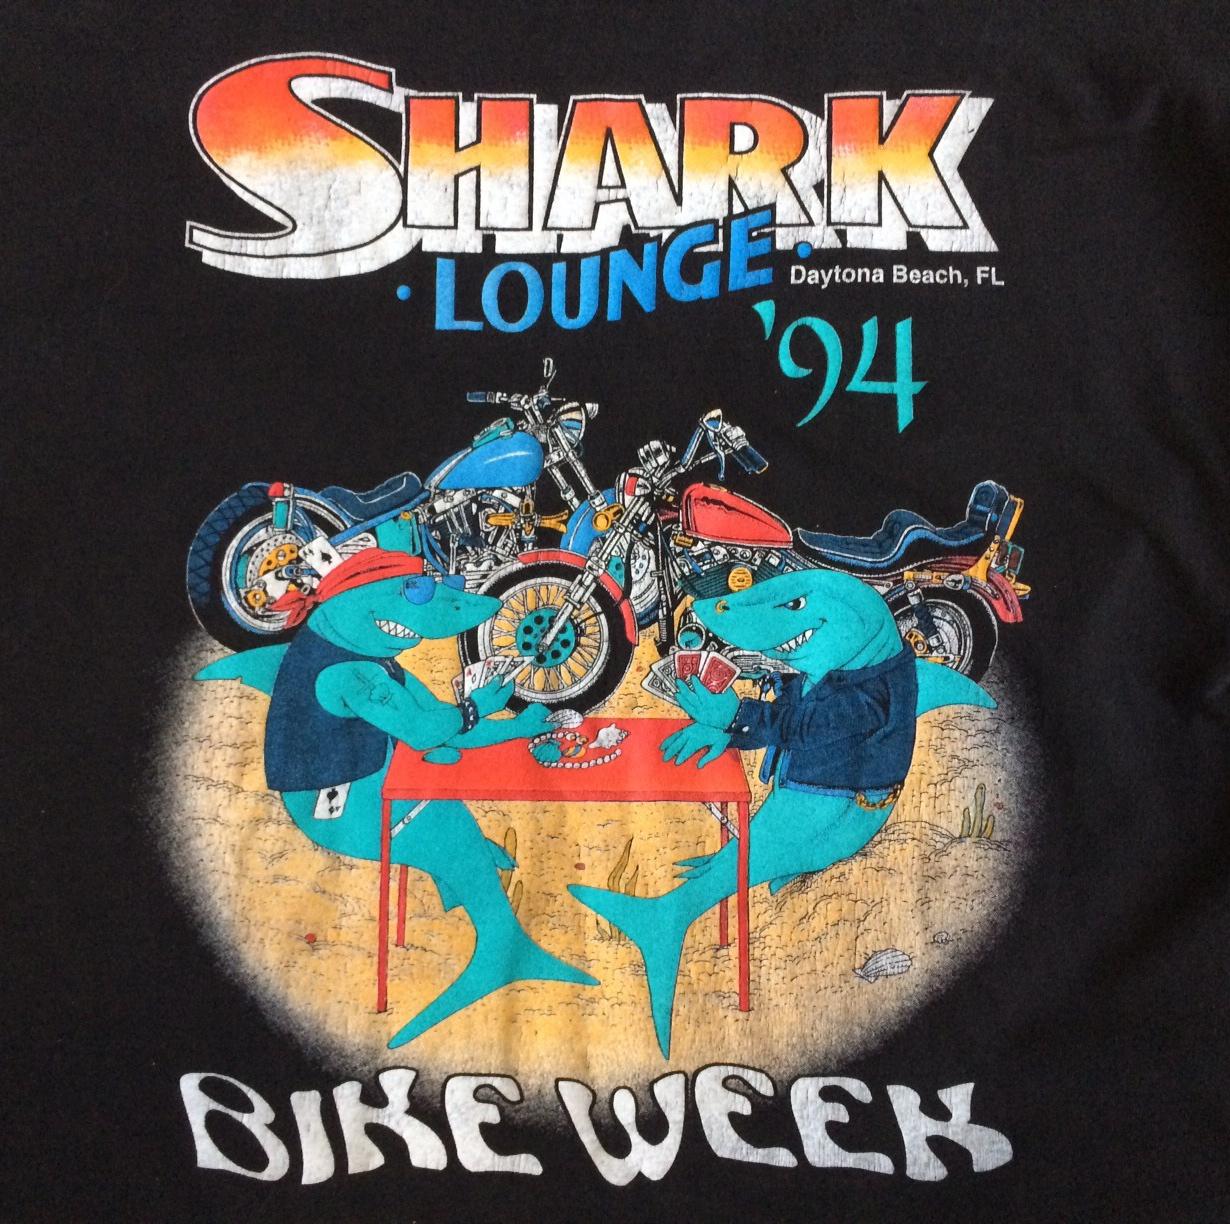 THE SHARK LOUNGE. |